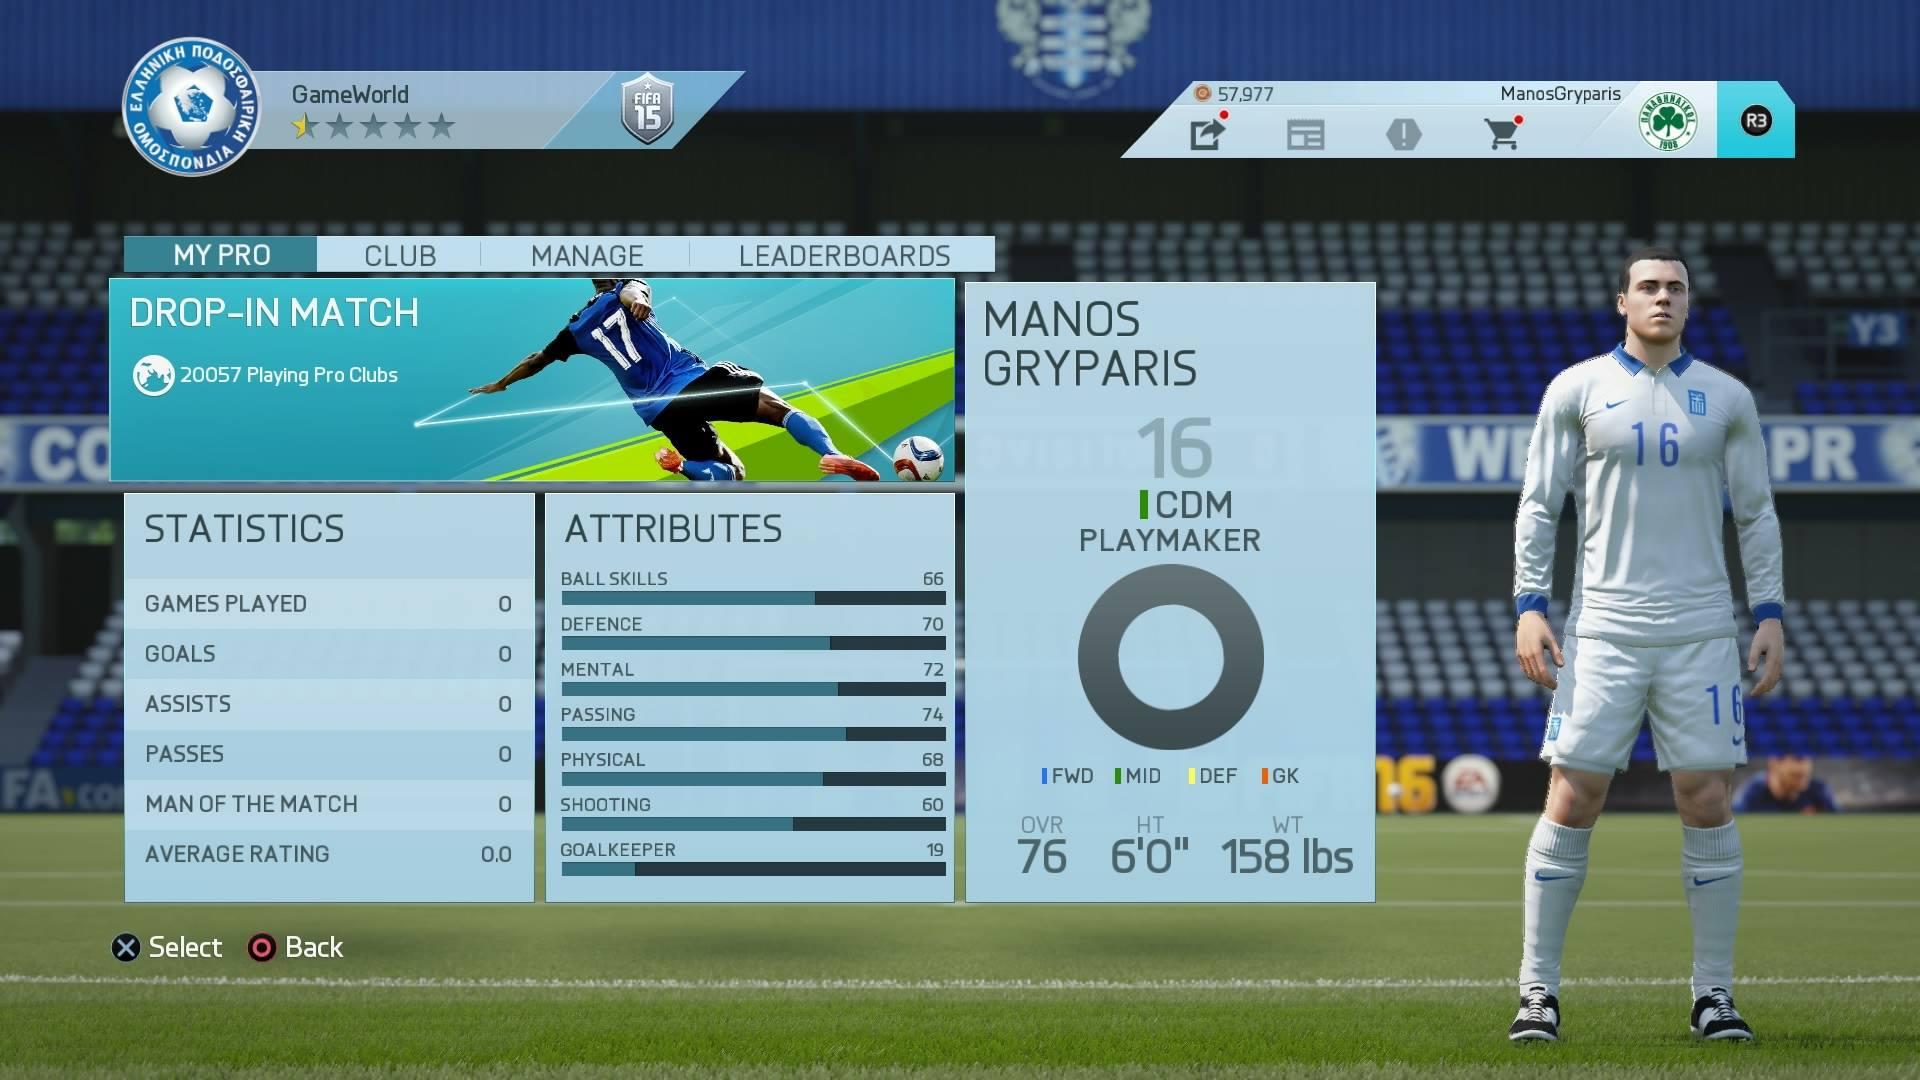 fifa-16-pro-clubs-gameworld.jpg